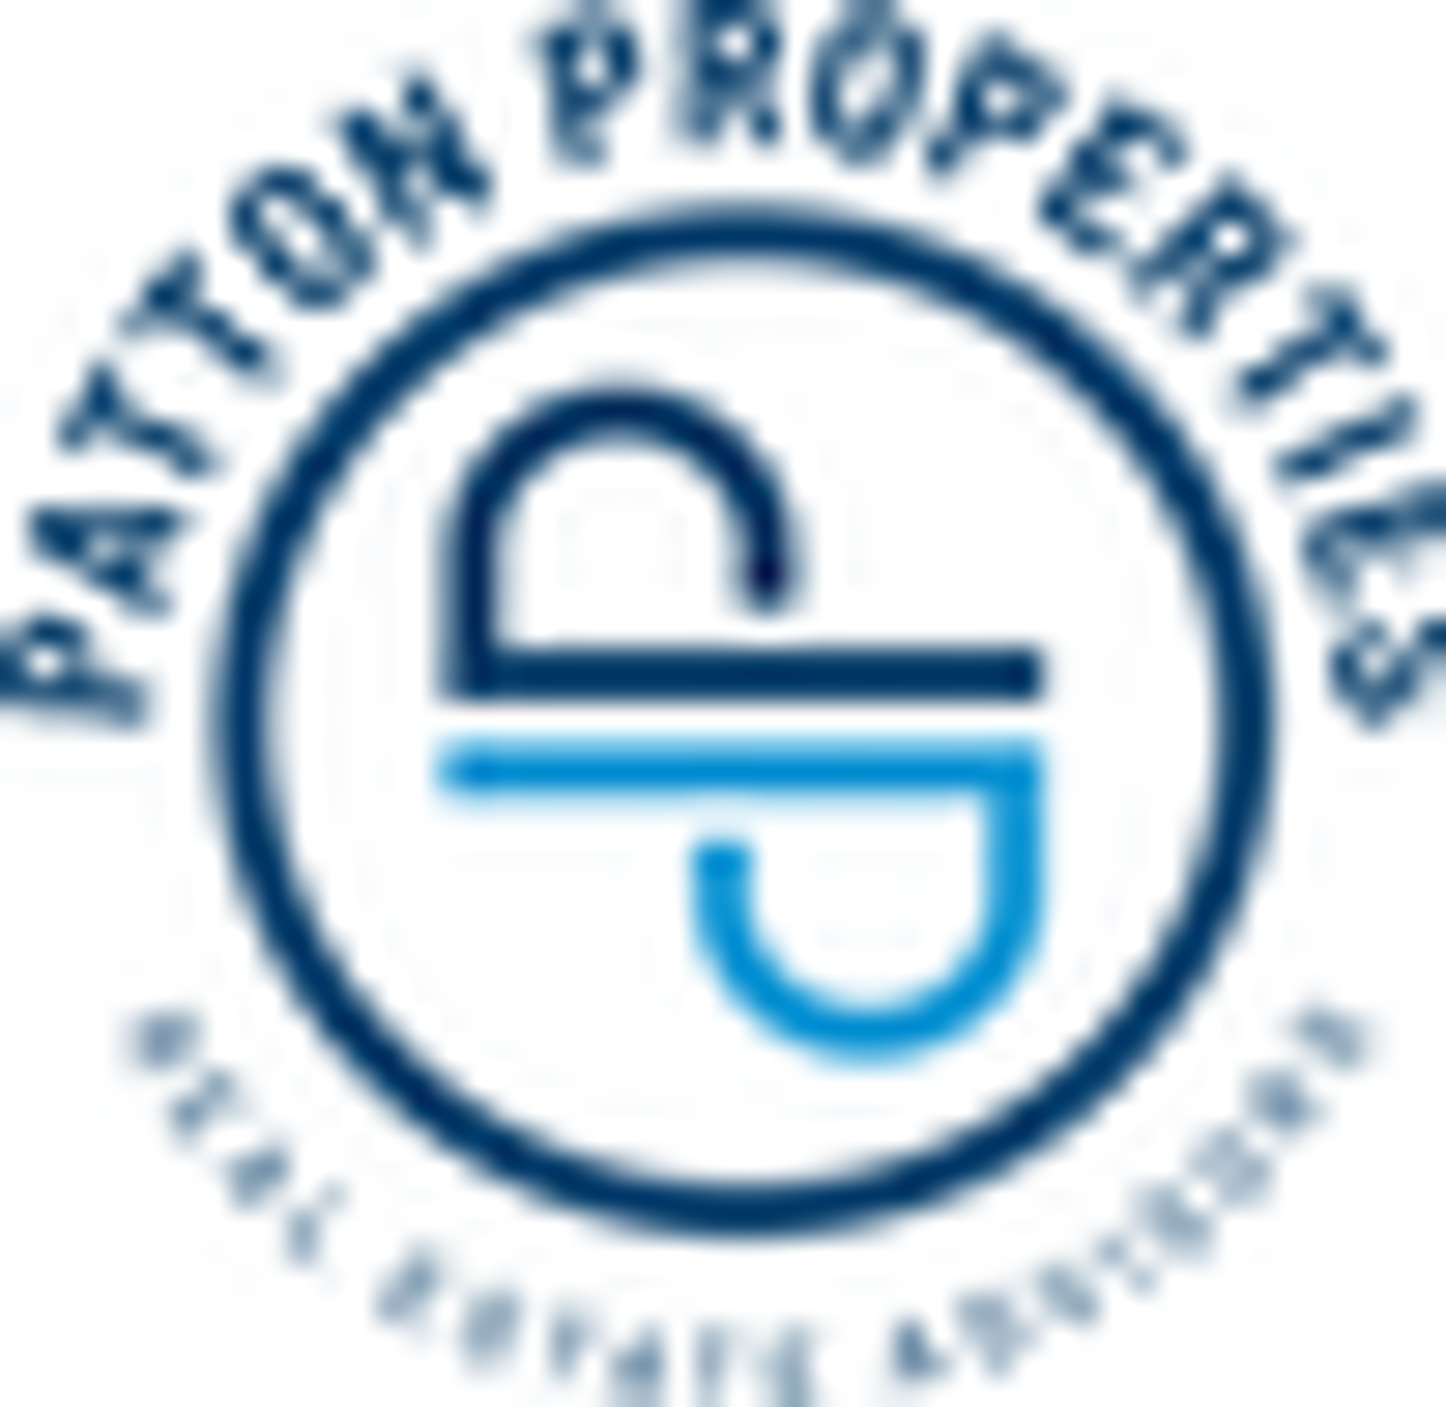 The Ryan Patton Group